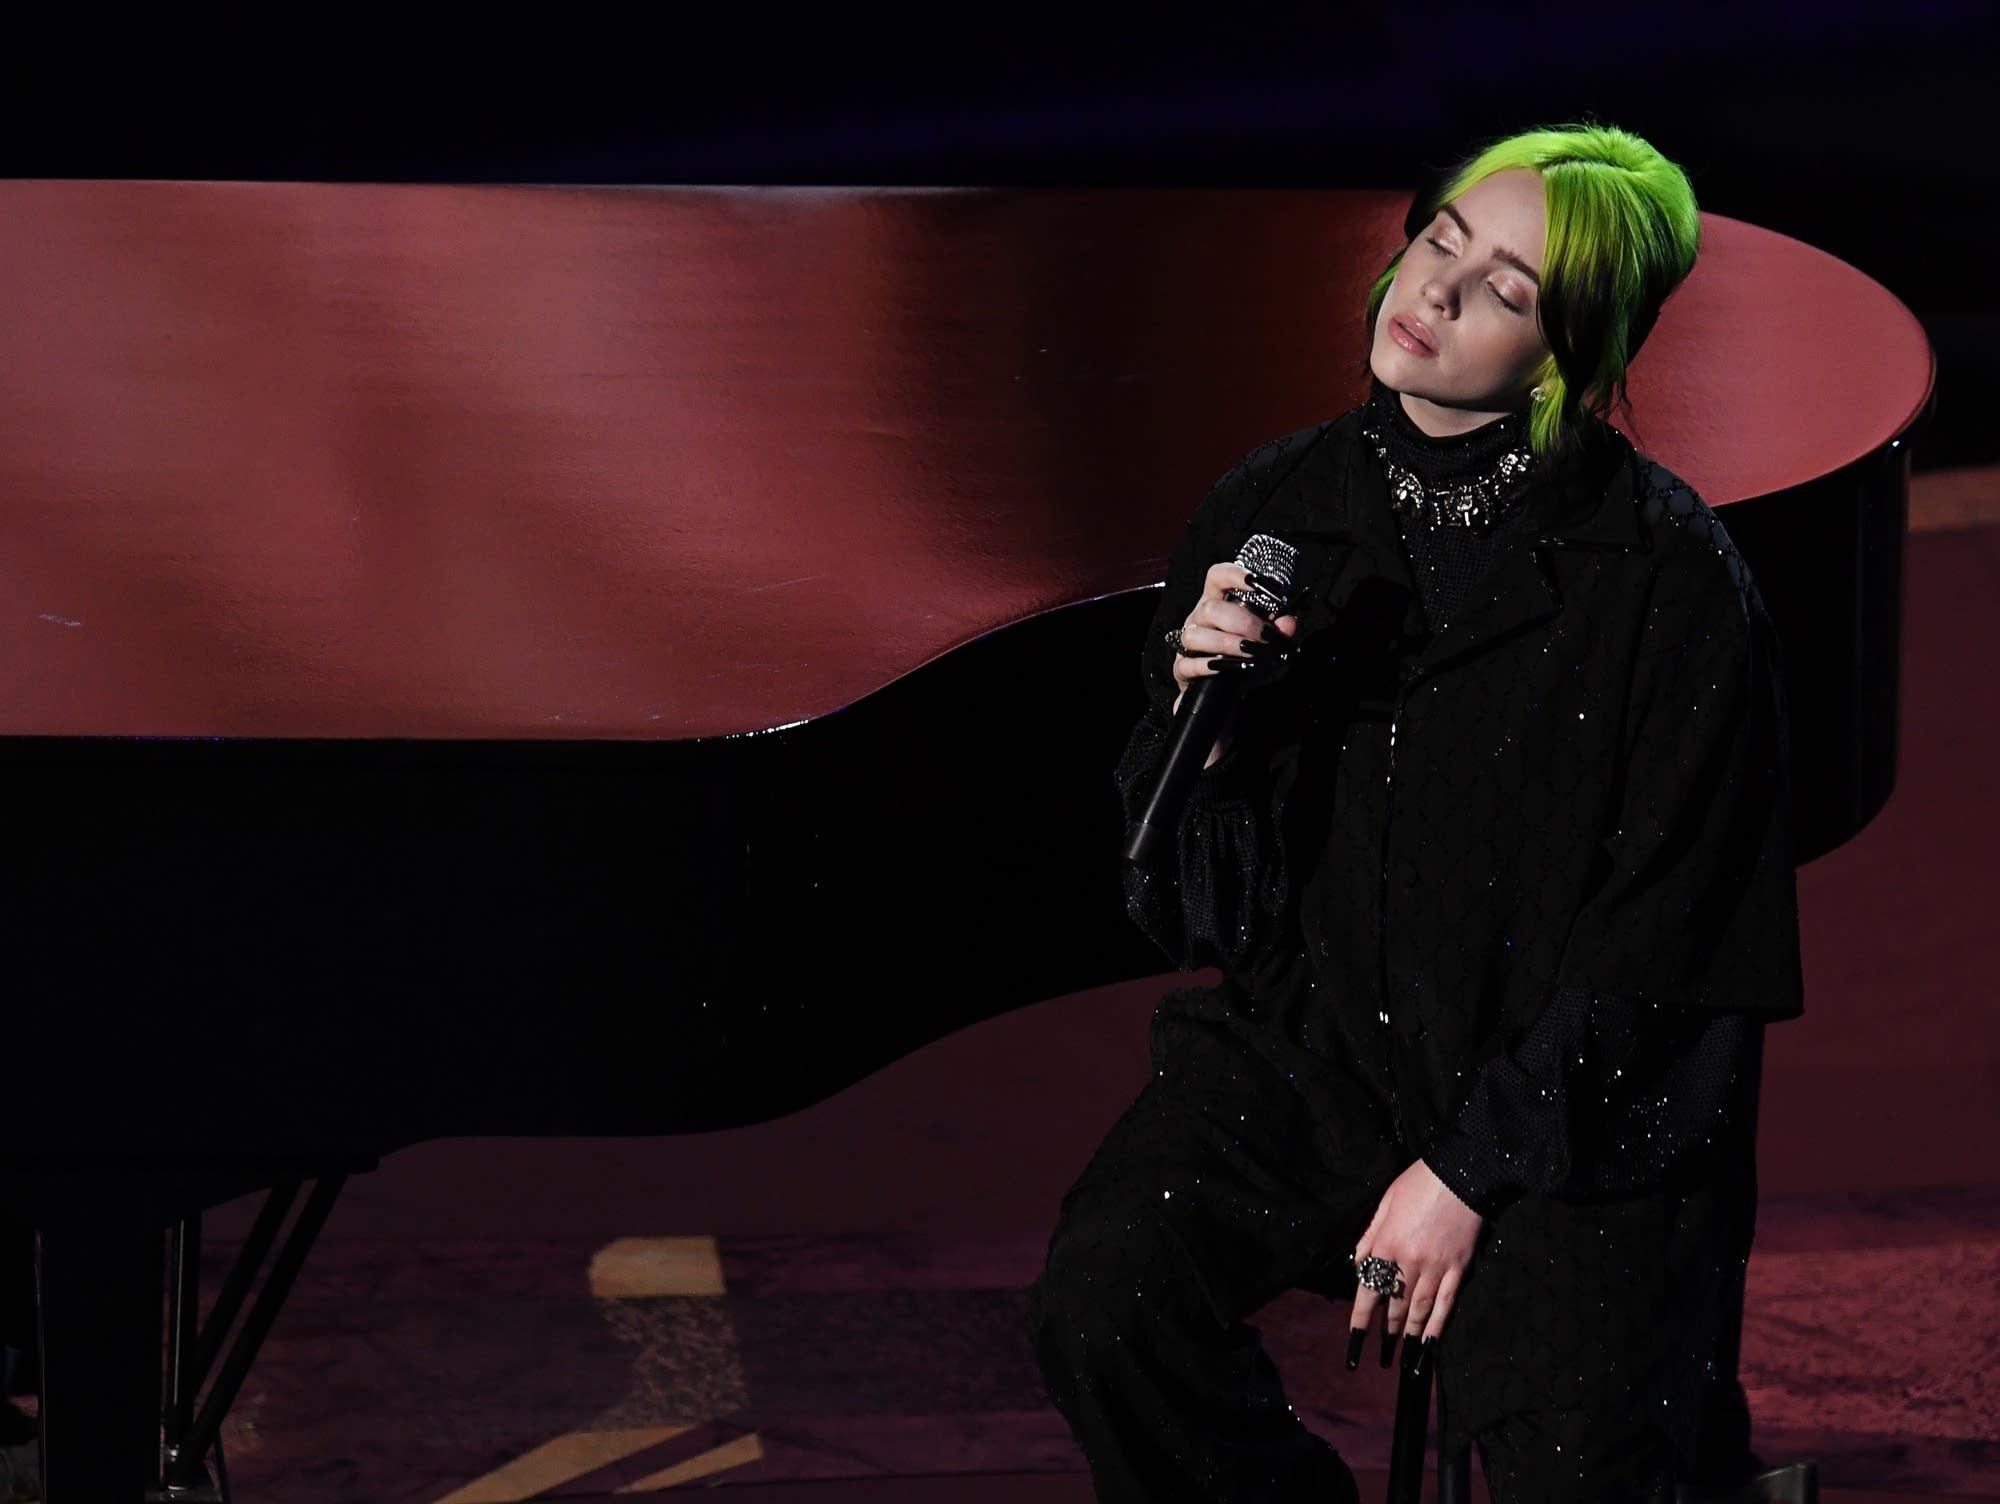 Billie Eilish performs at the Academy Awards, February 2020.